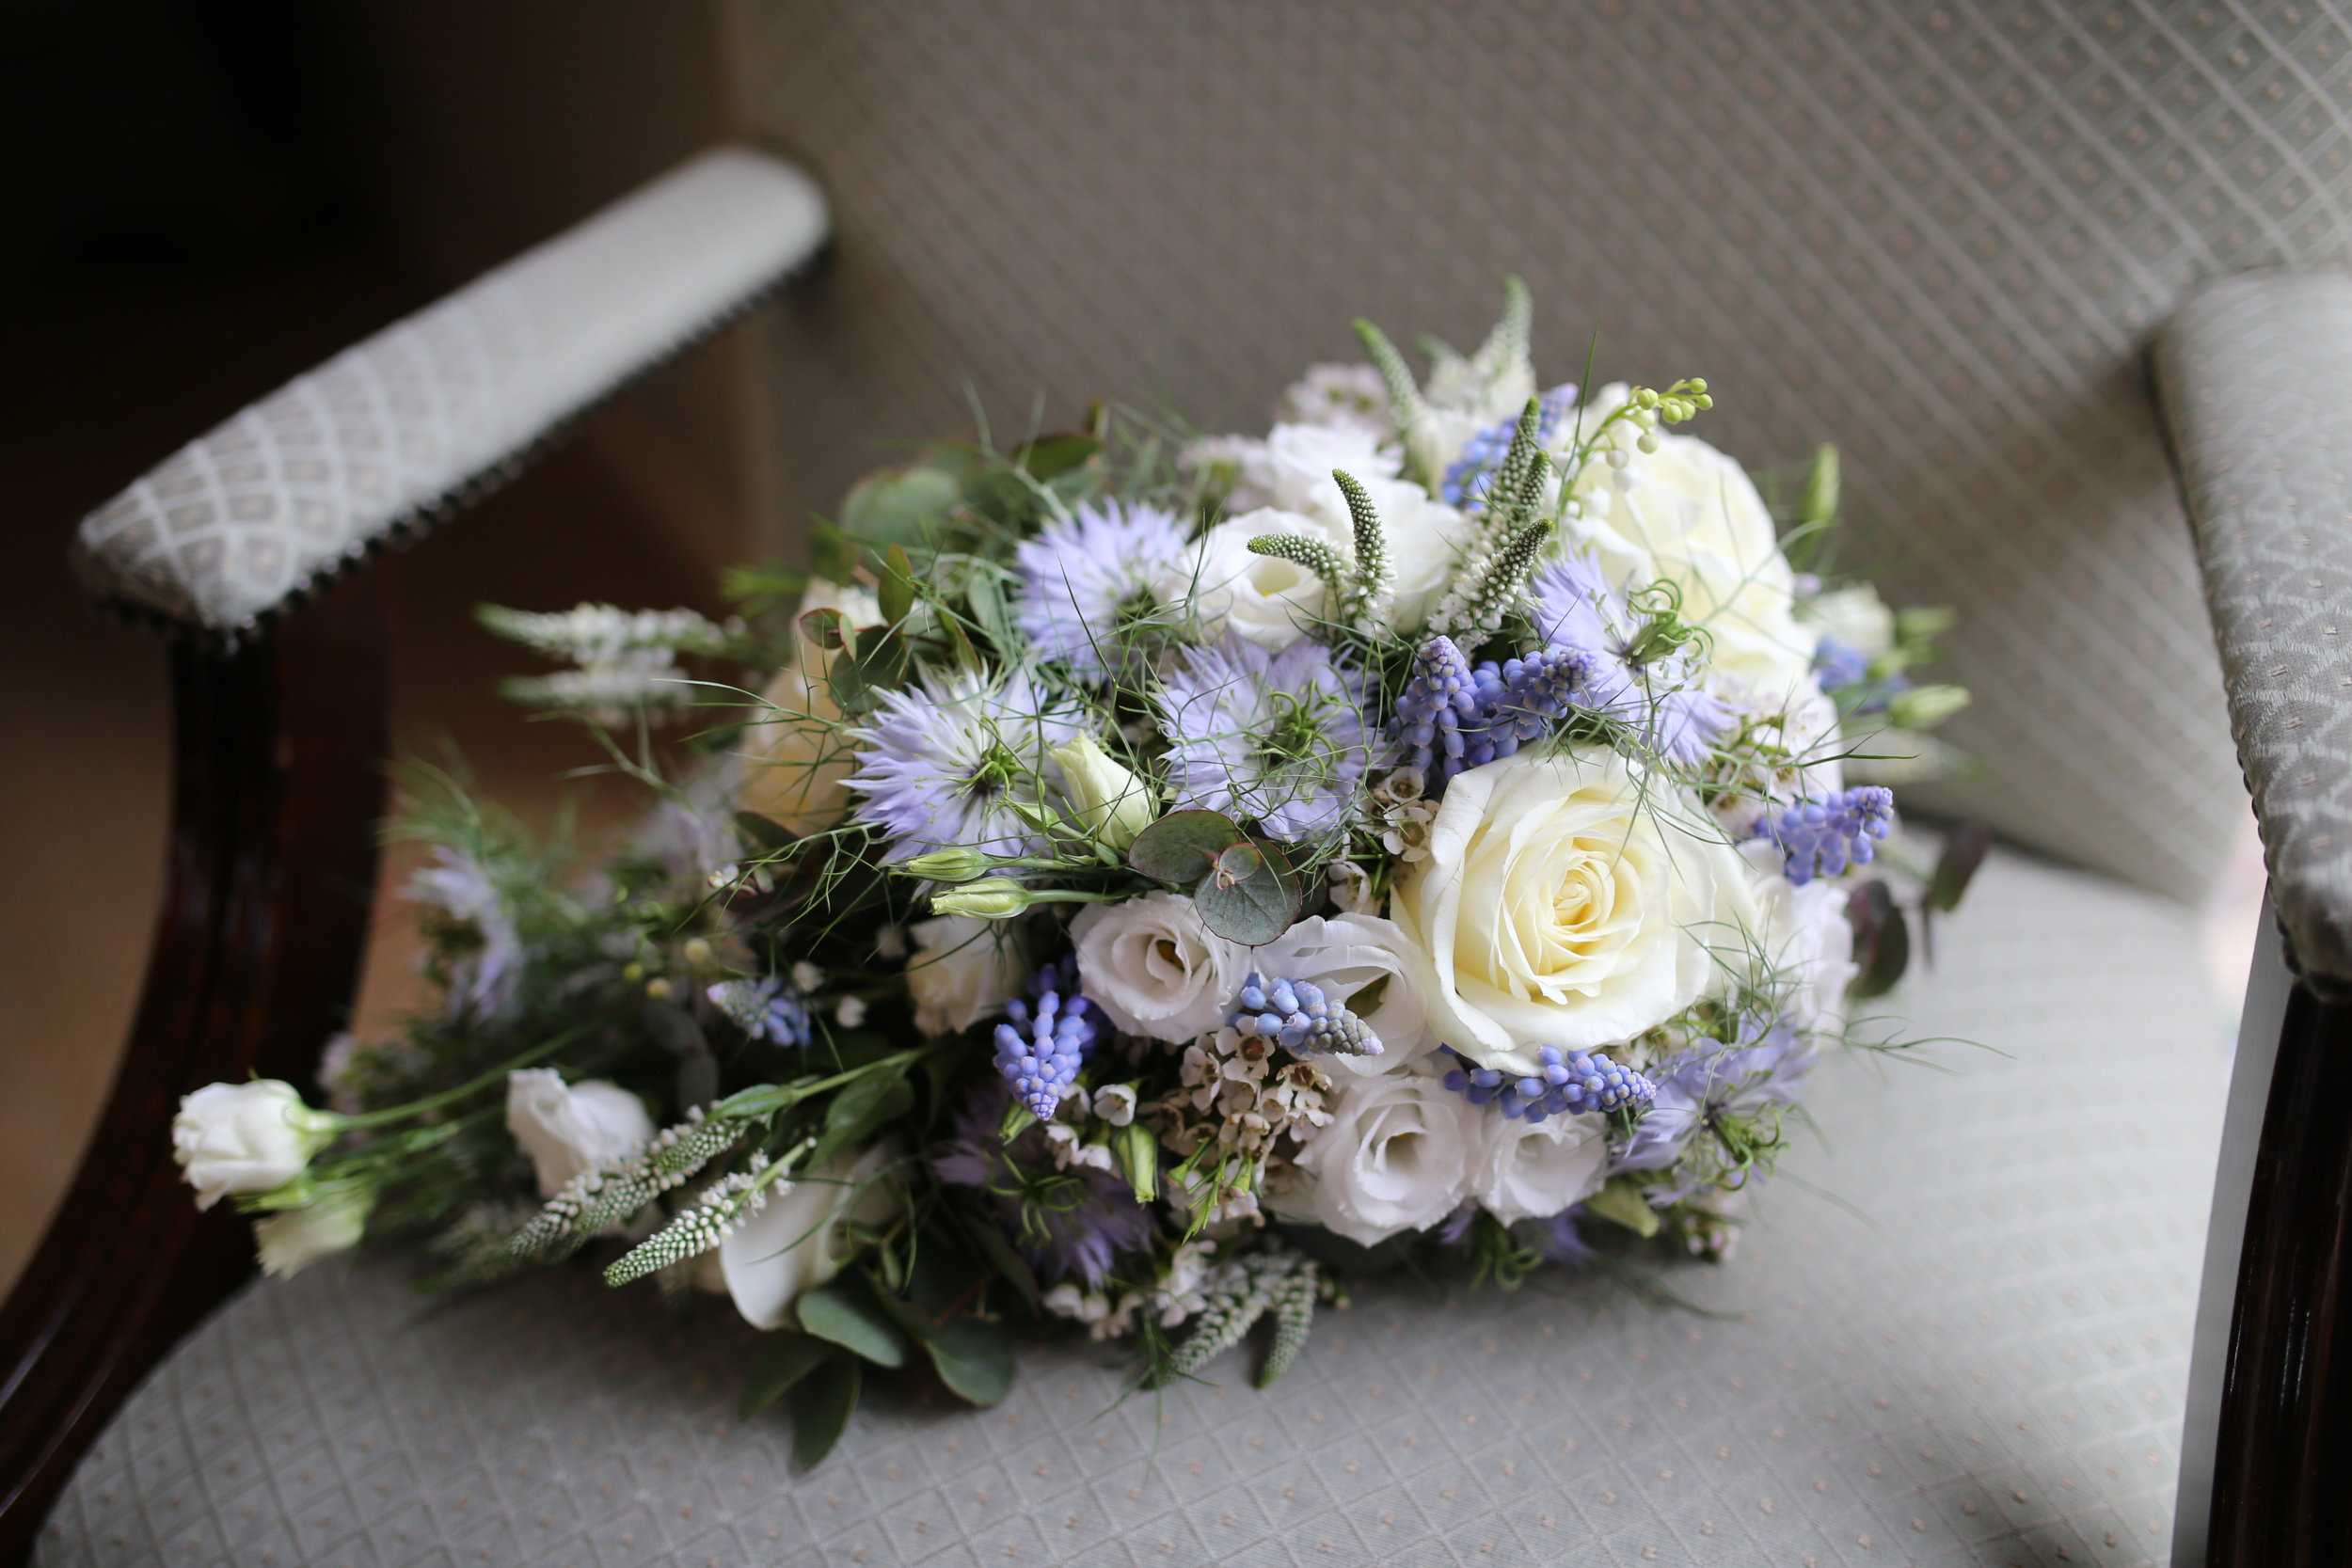 MIRIAM_FAITH_WEDDING_FLOWERS_BRIDE_BOUQUET_CASCADE_BLUE_WHITE.JPG